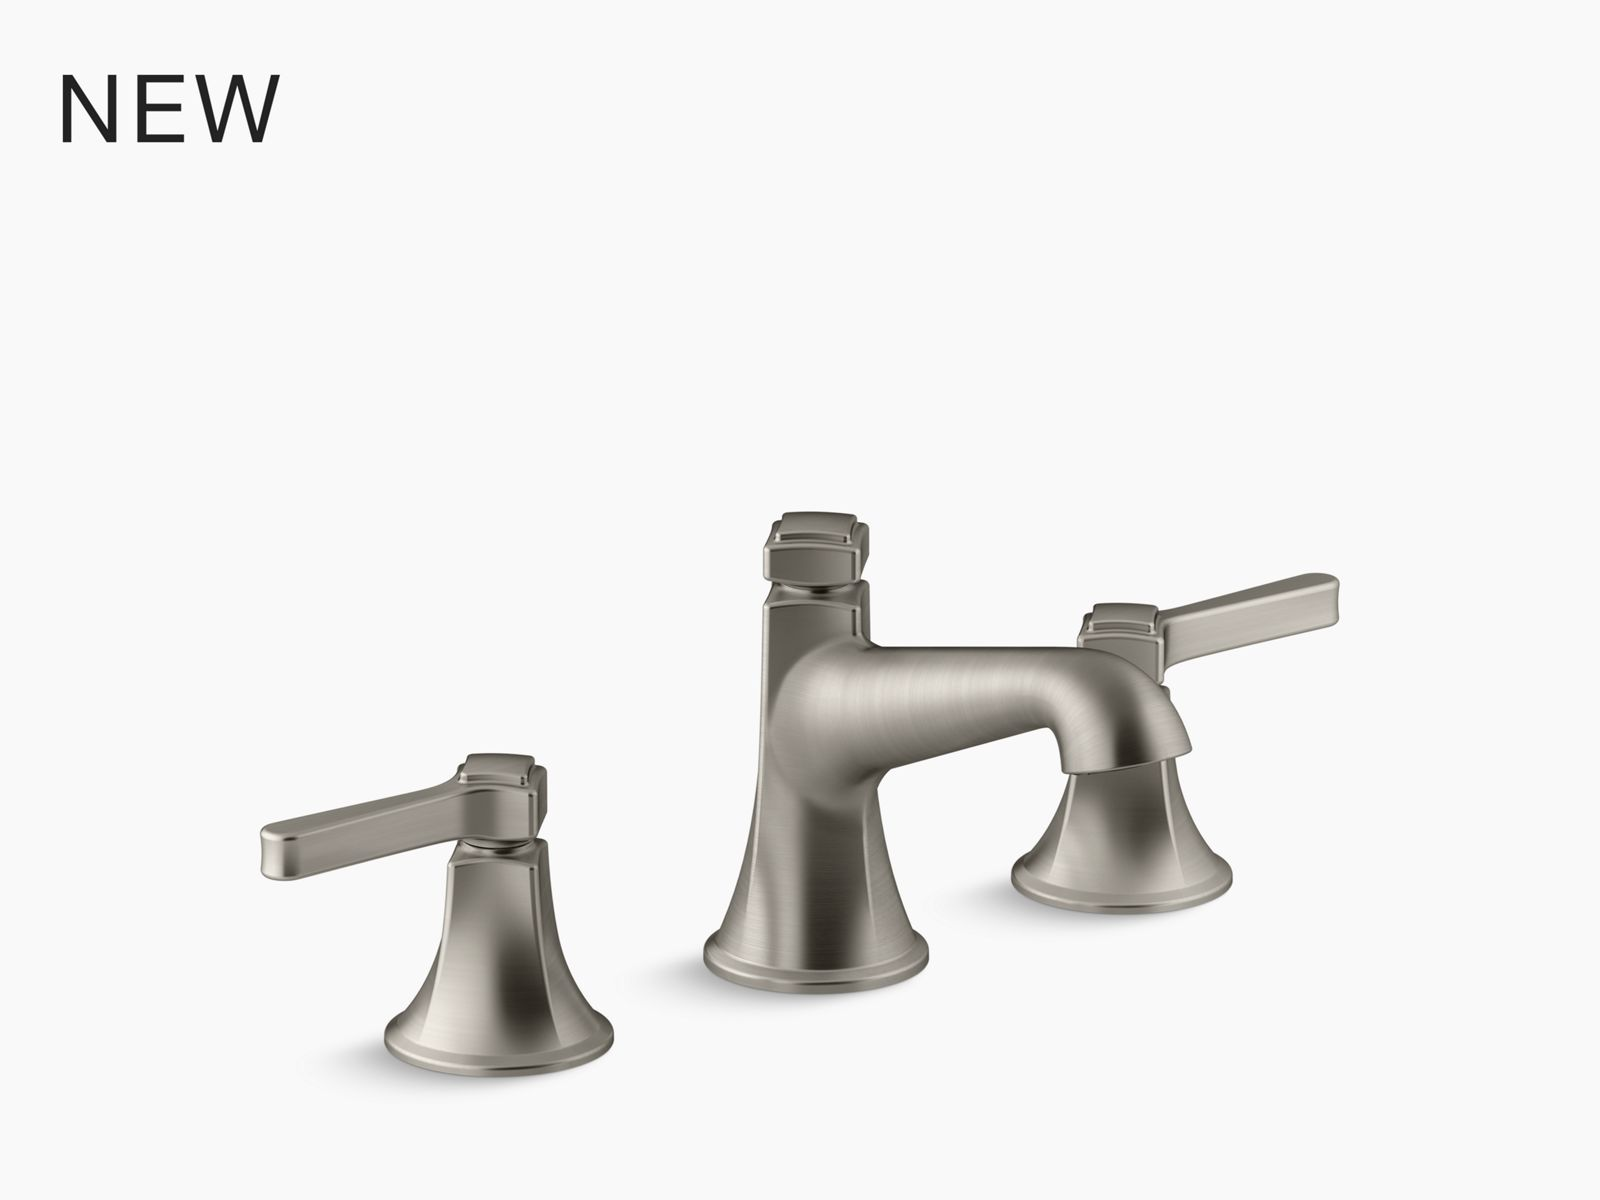 bancroft widespread bathroom sink faucet with metal lever handles